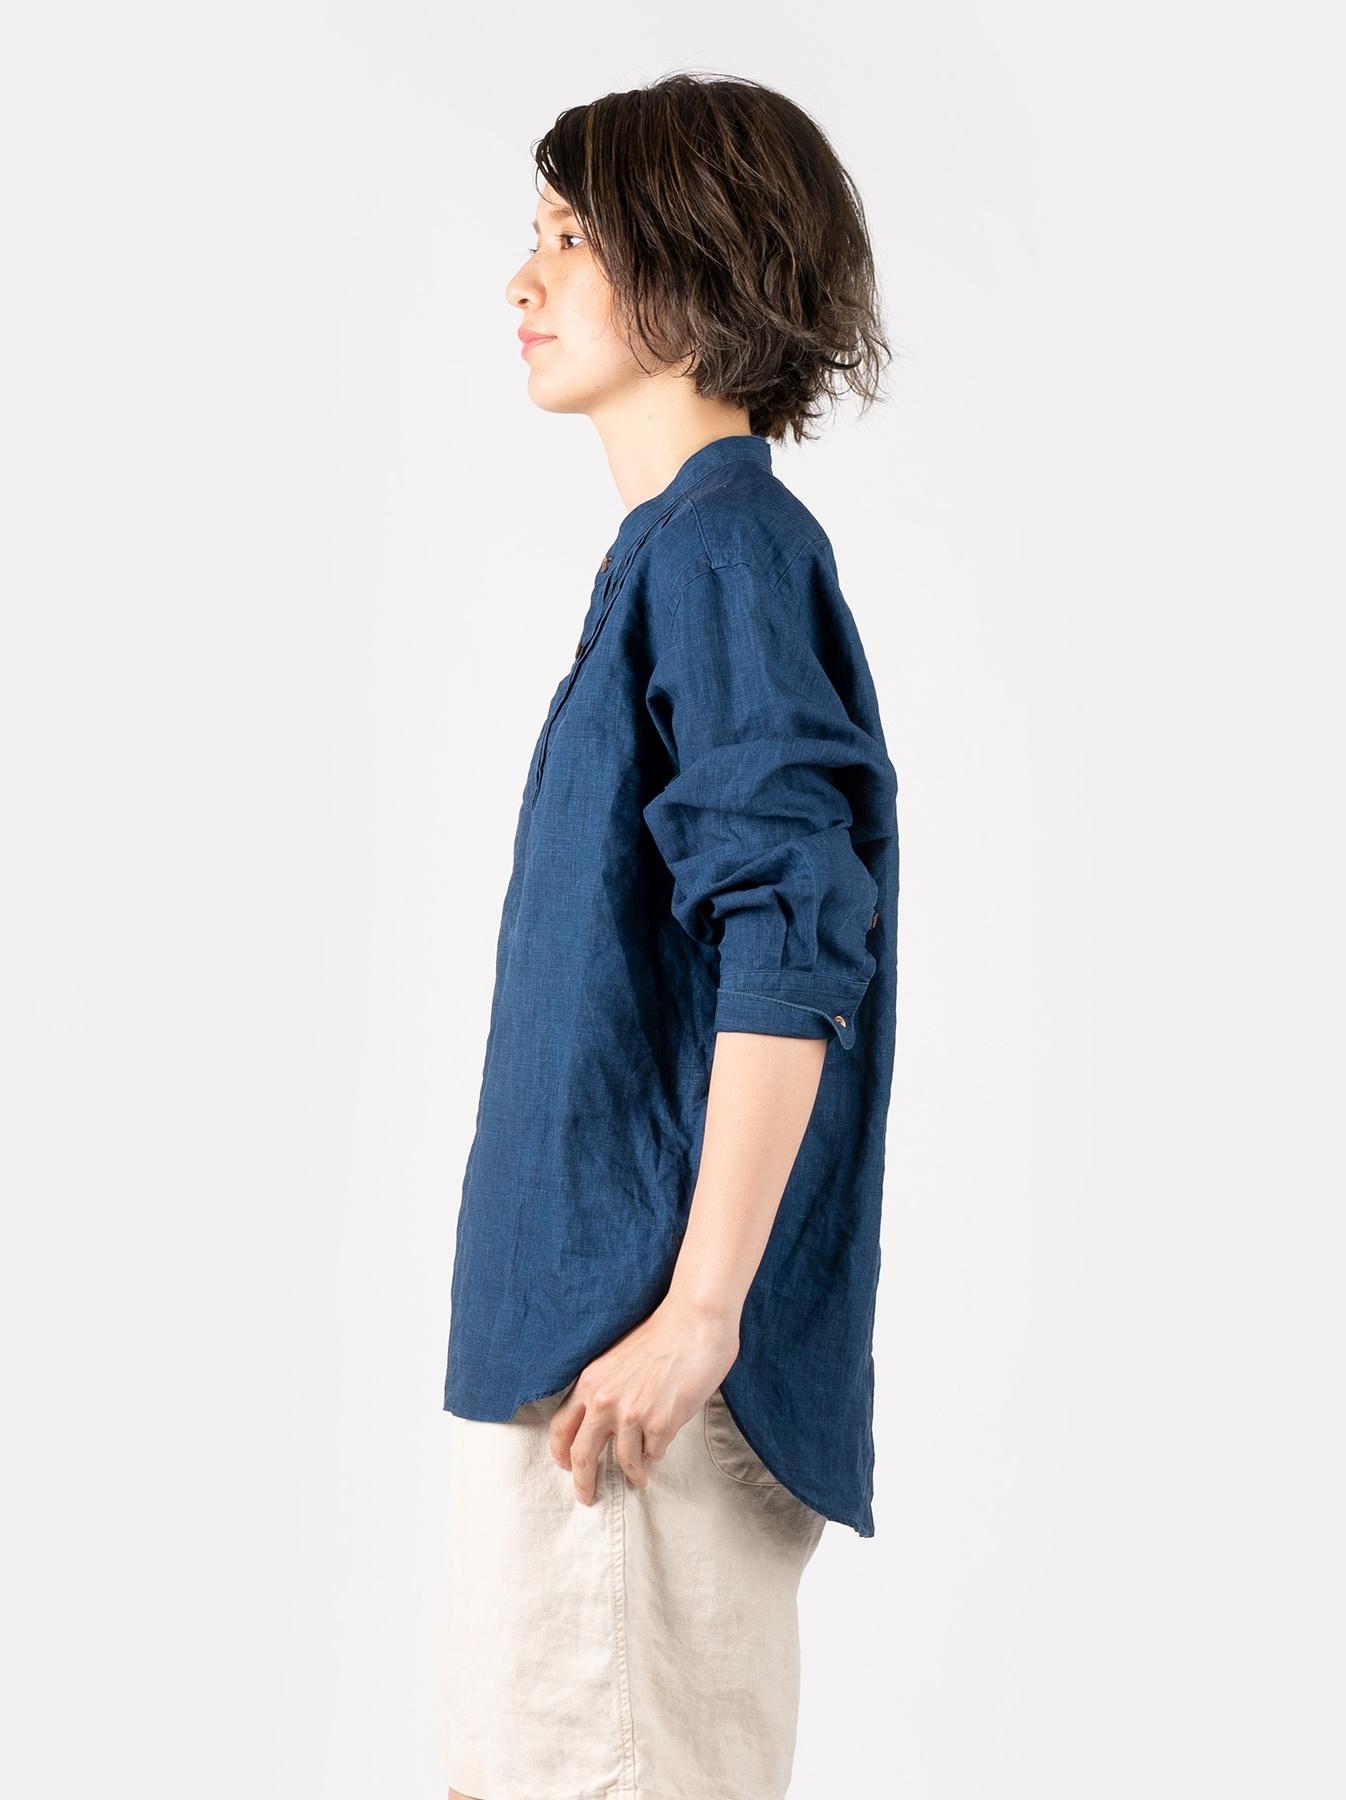 WH Indigo Linen Pin-tuck 908 Shirt-6